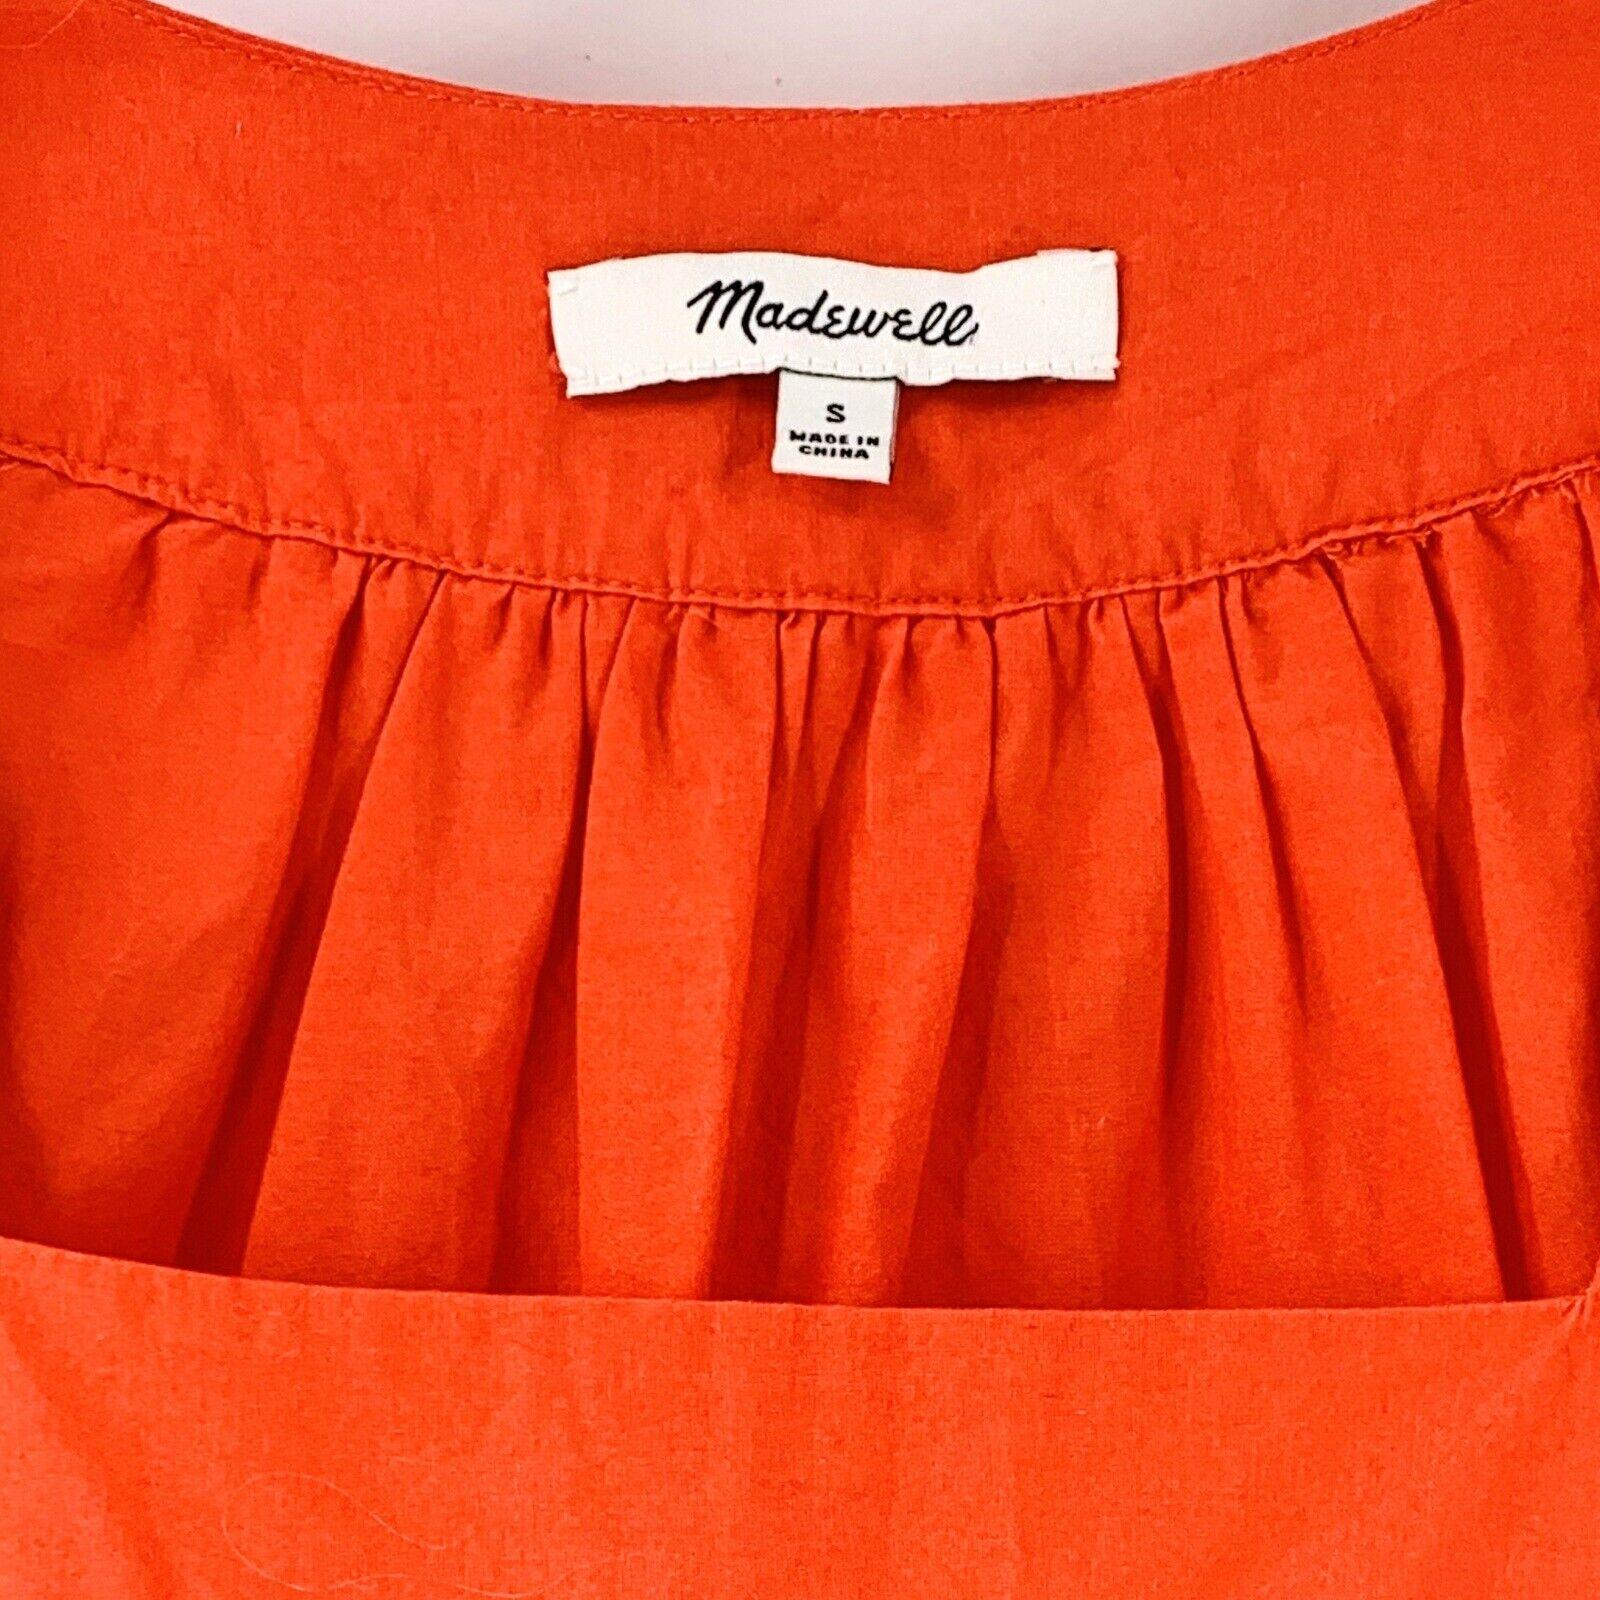 Madewell Orange Cotton Eyelet Angelica Top Size S… - image 5